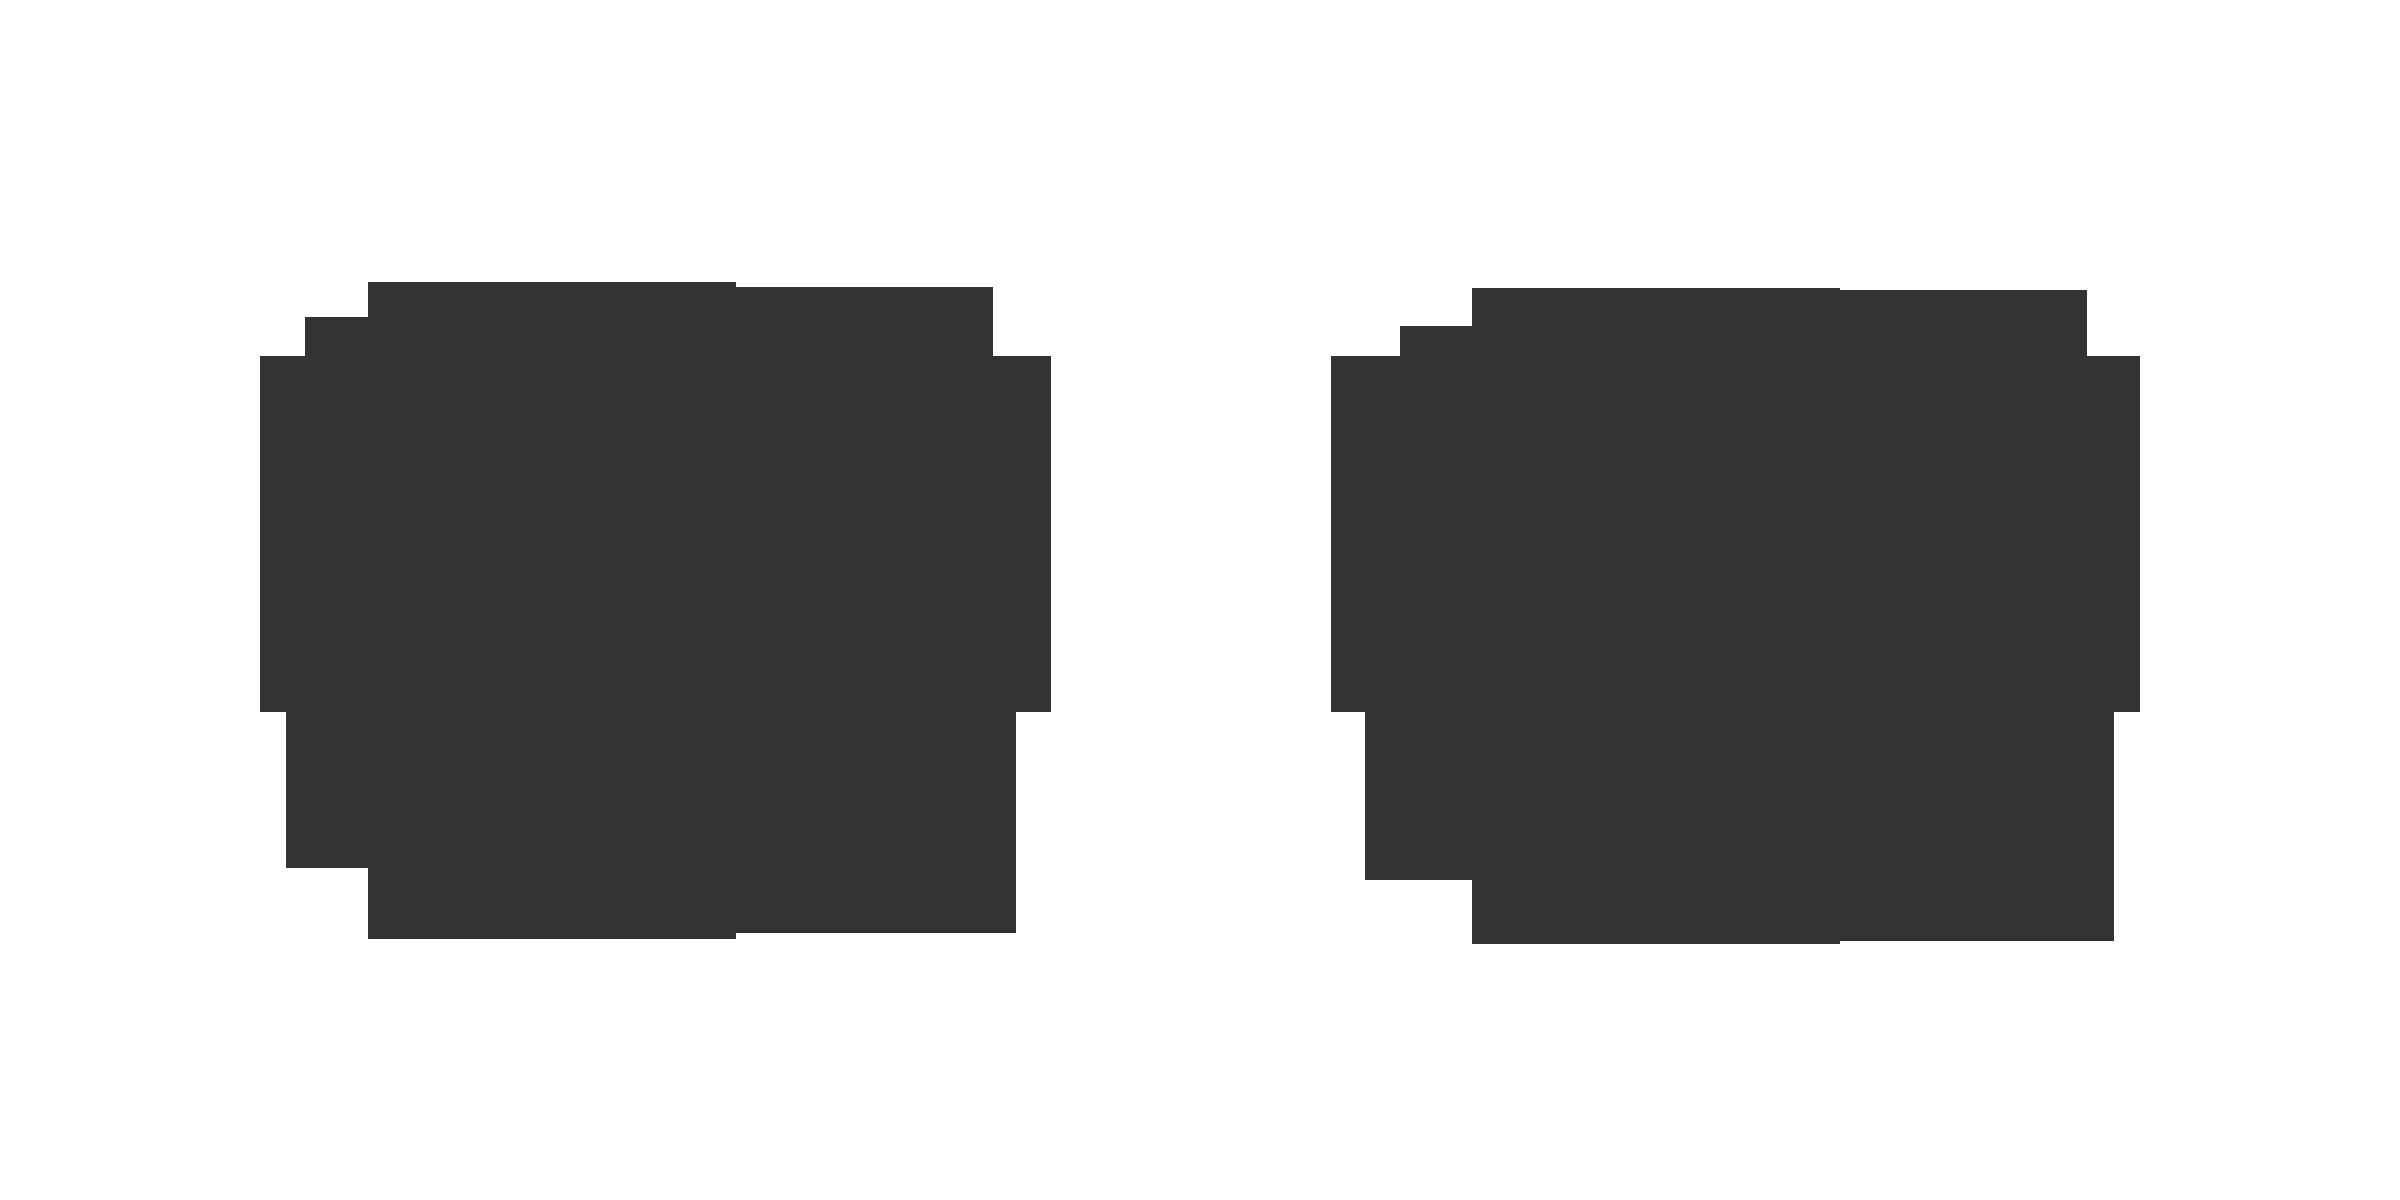 Lunettes de vue et verres correcteurs en ligne   EyeBuyDirect ... 8f37e609ef73